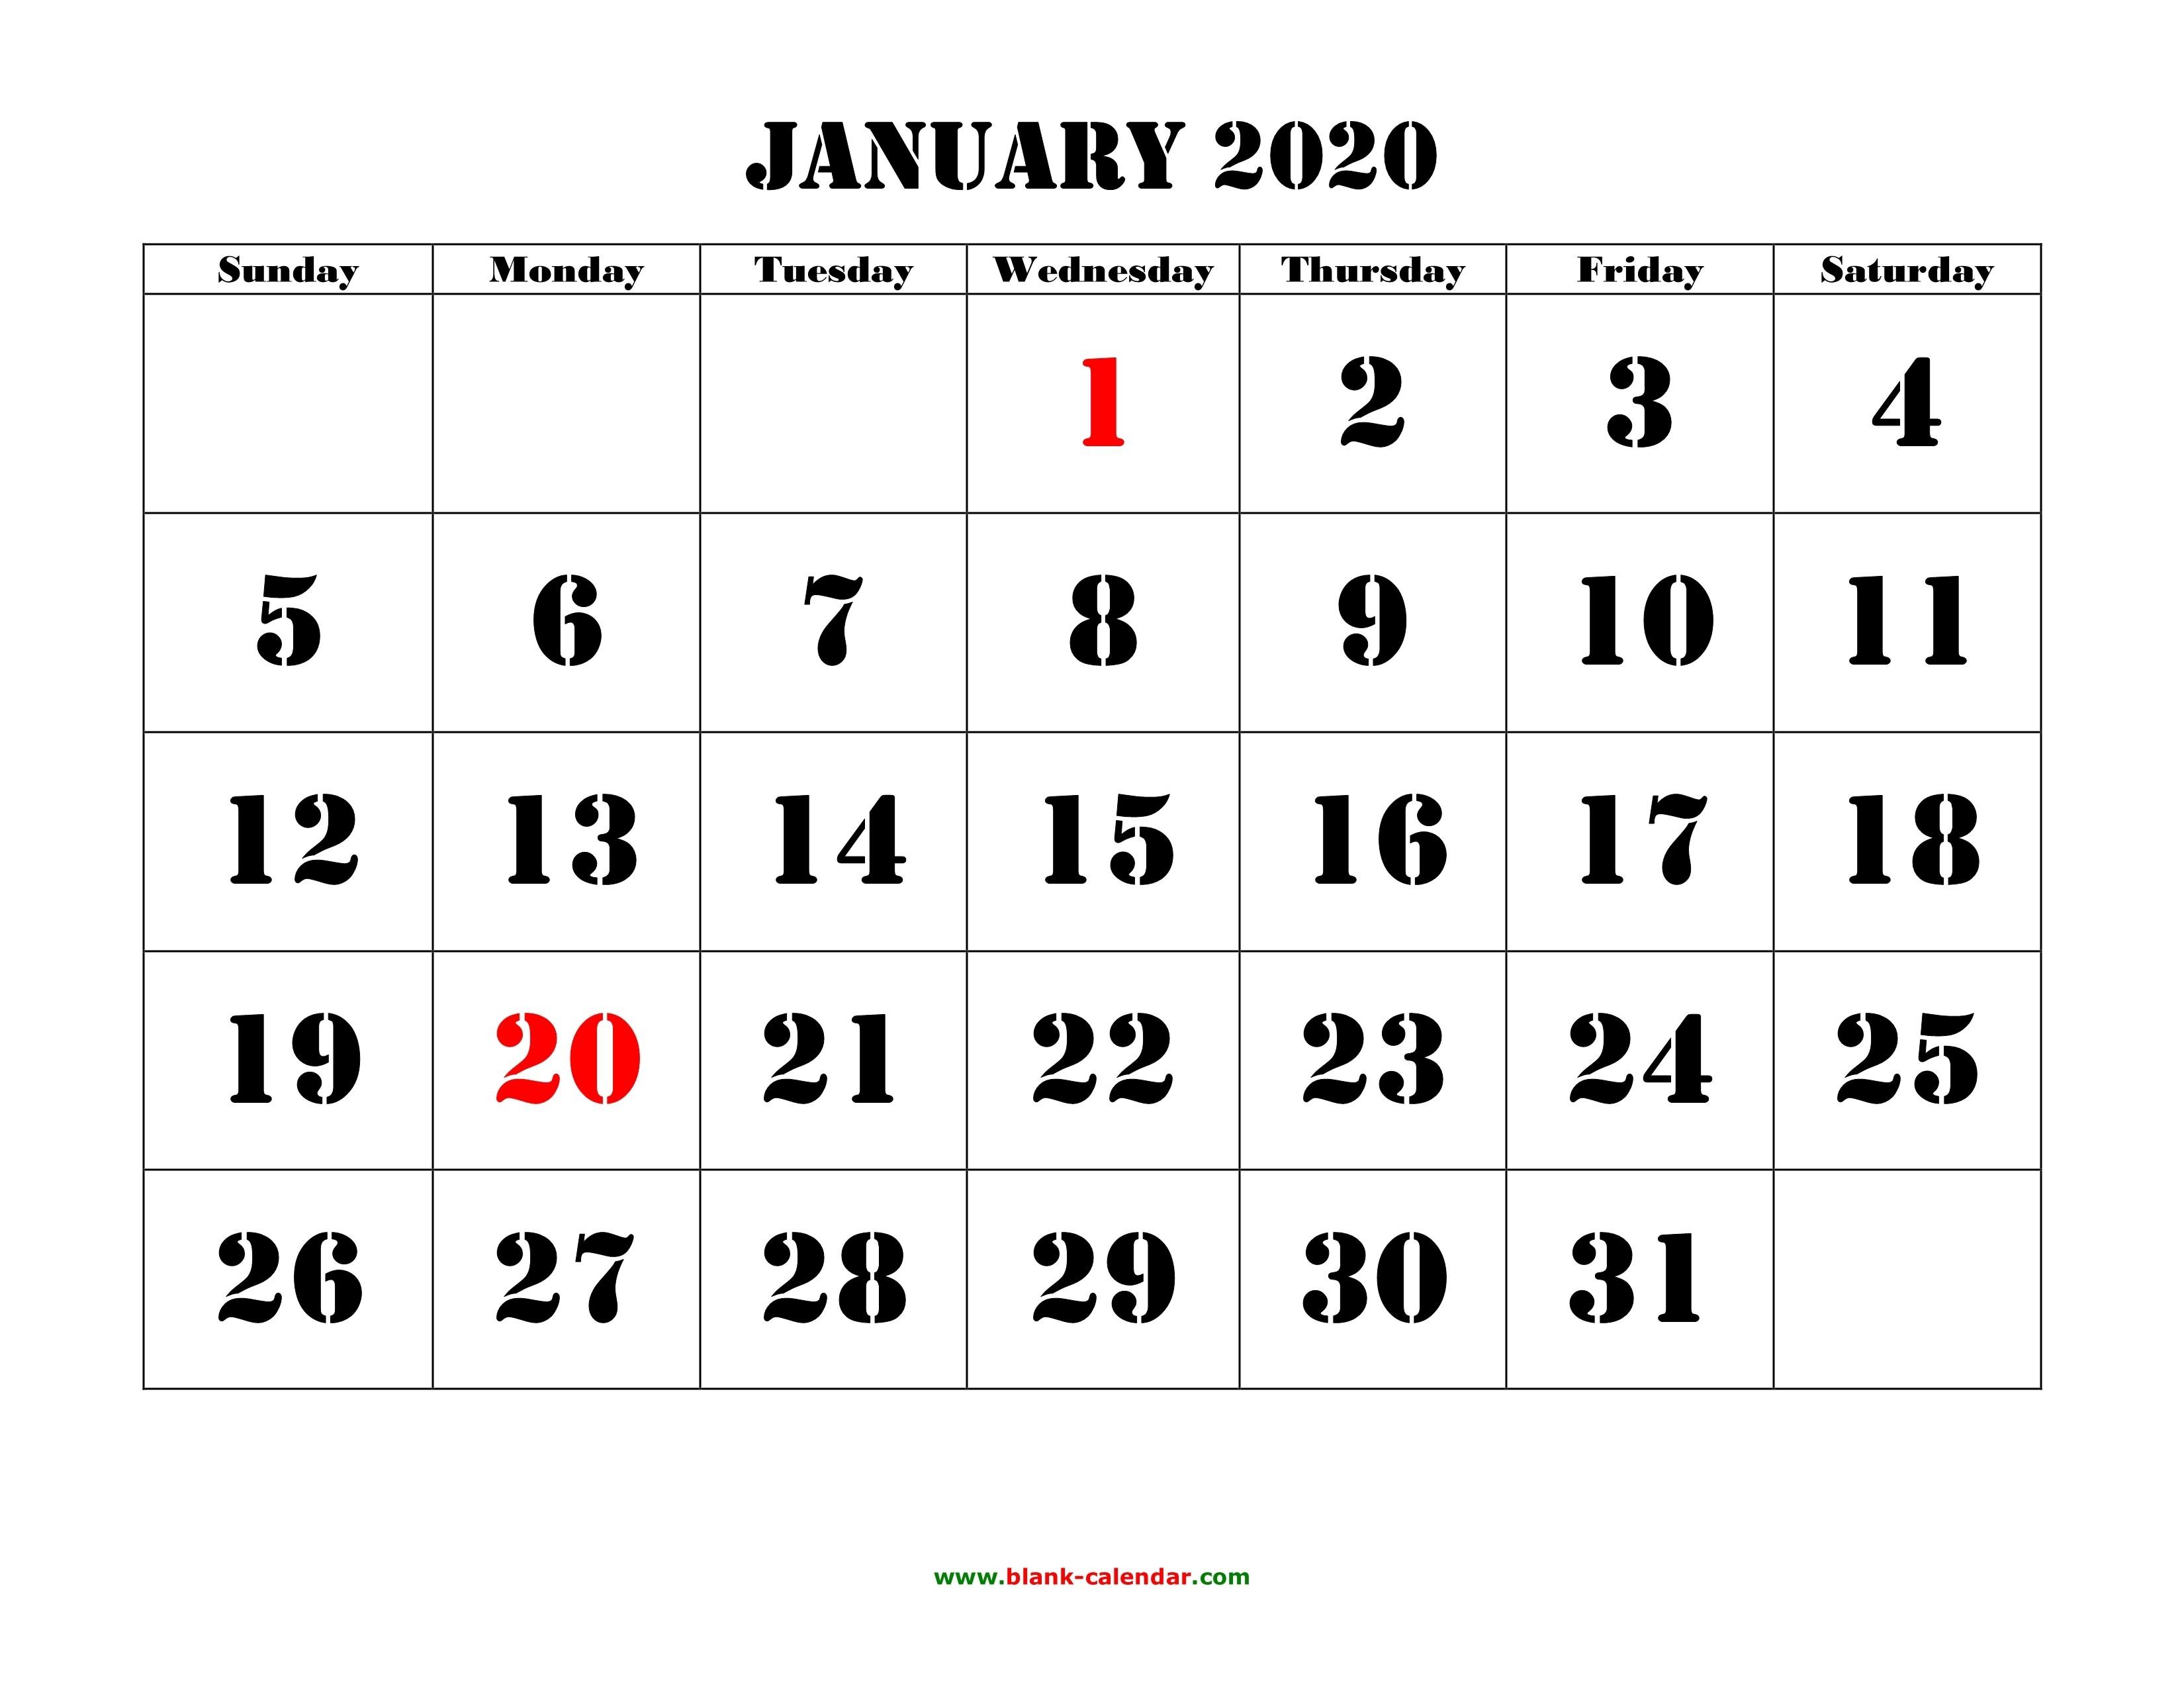 Printable January 2020 Calendar - Free Blank Templates-January 2020 Printable Calendar With Holidays